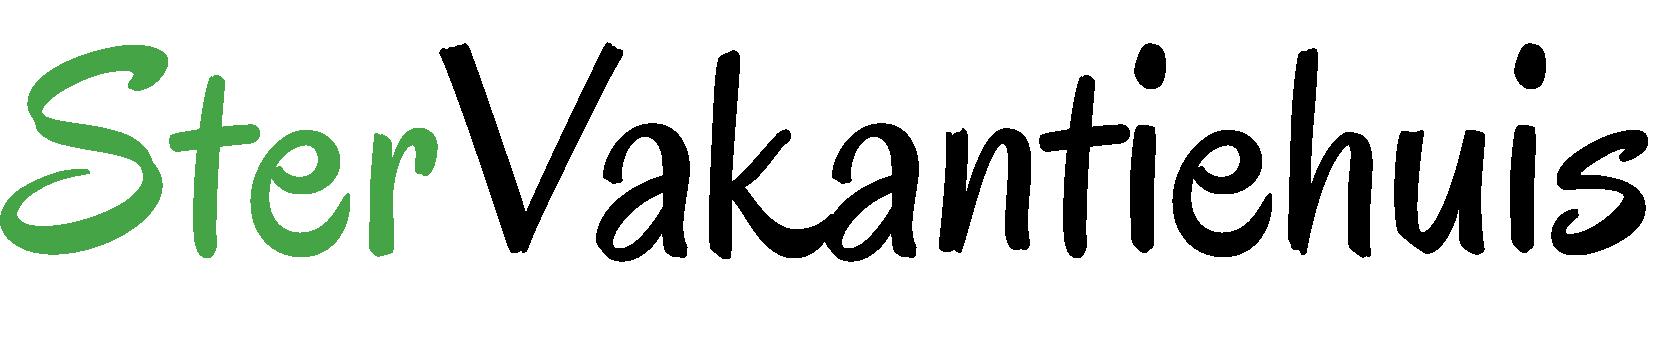 SterVakantiehuis_Logo